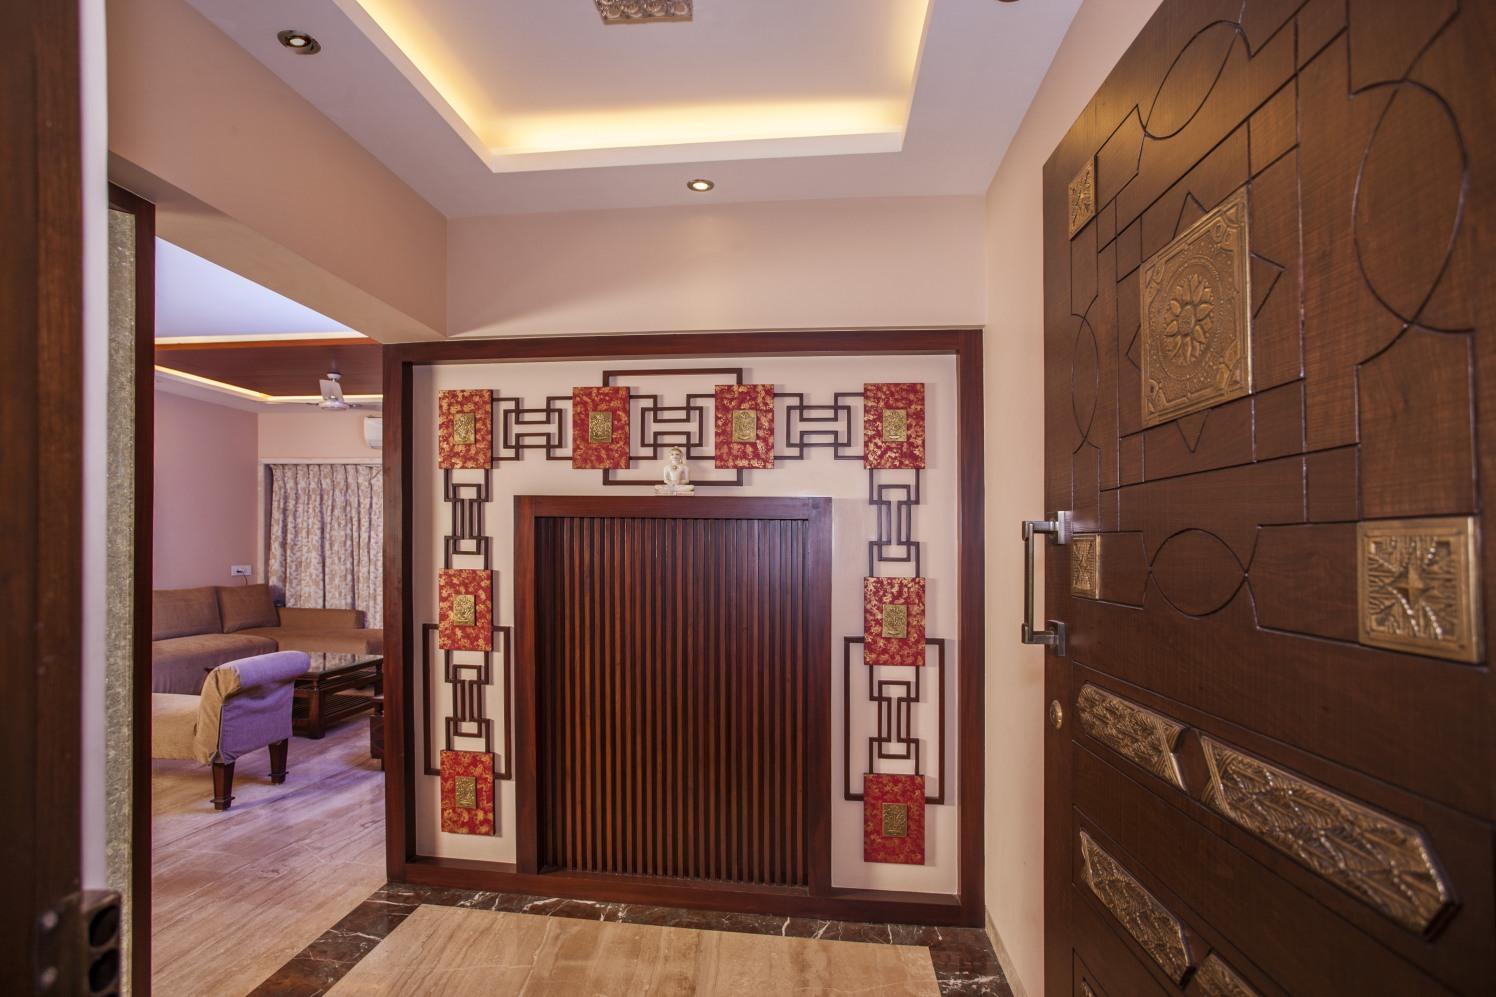 Mystique Brown by Plus One Interiors Indoor-spaces Contemporary | Interior Design Photos & Ideas